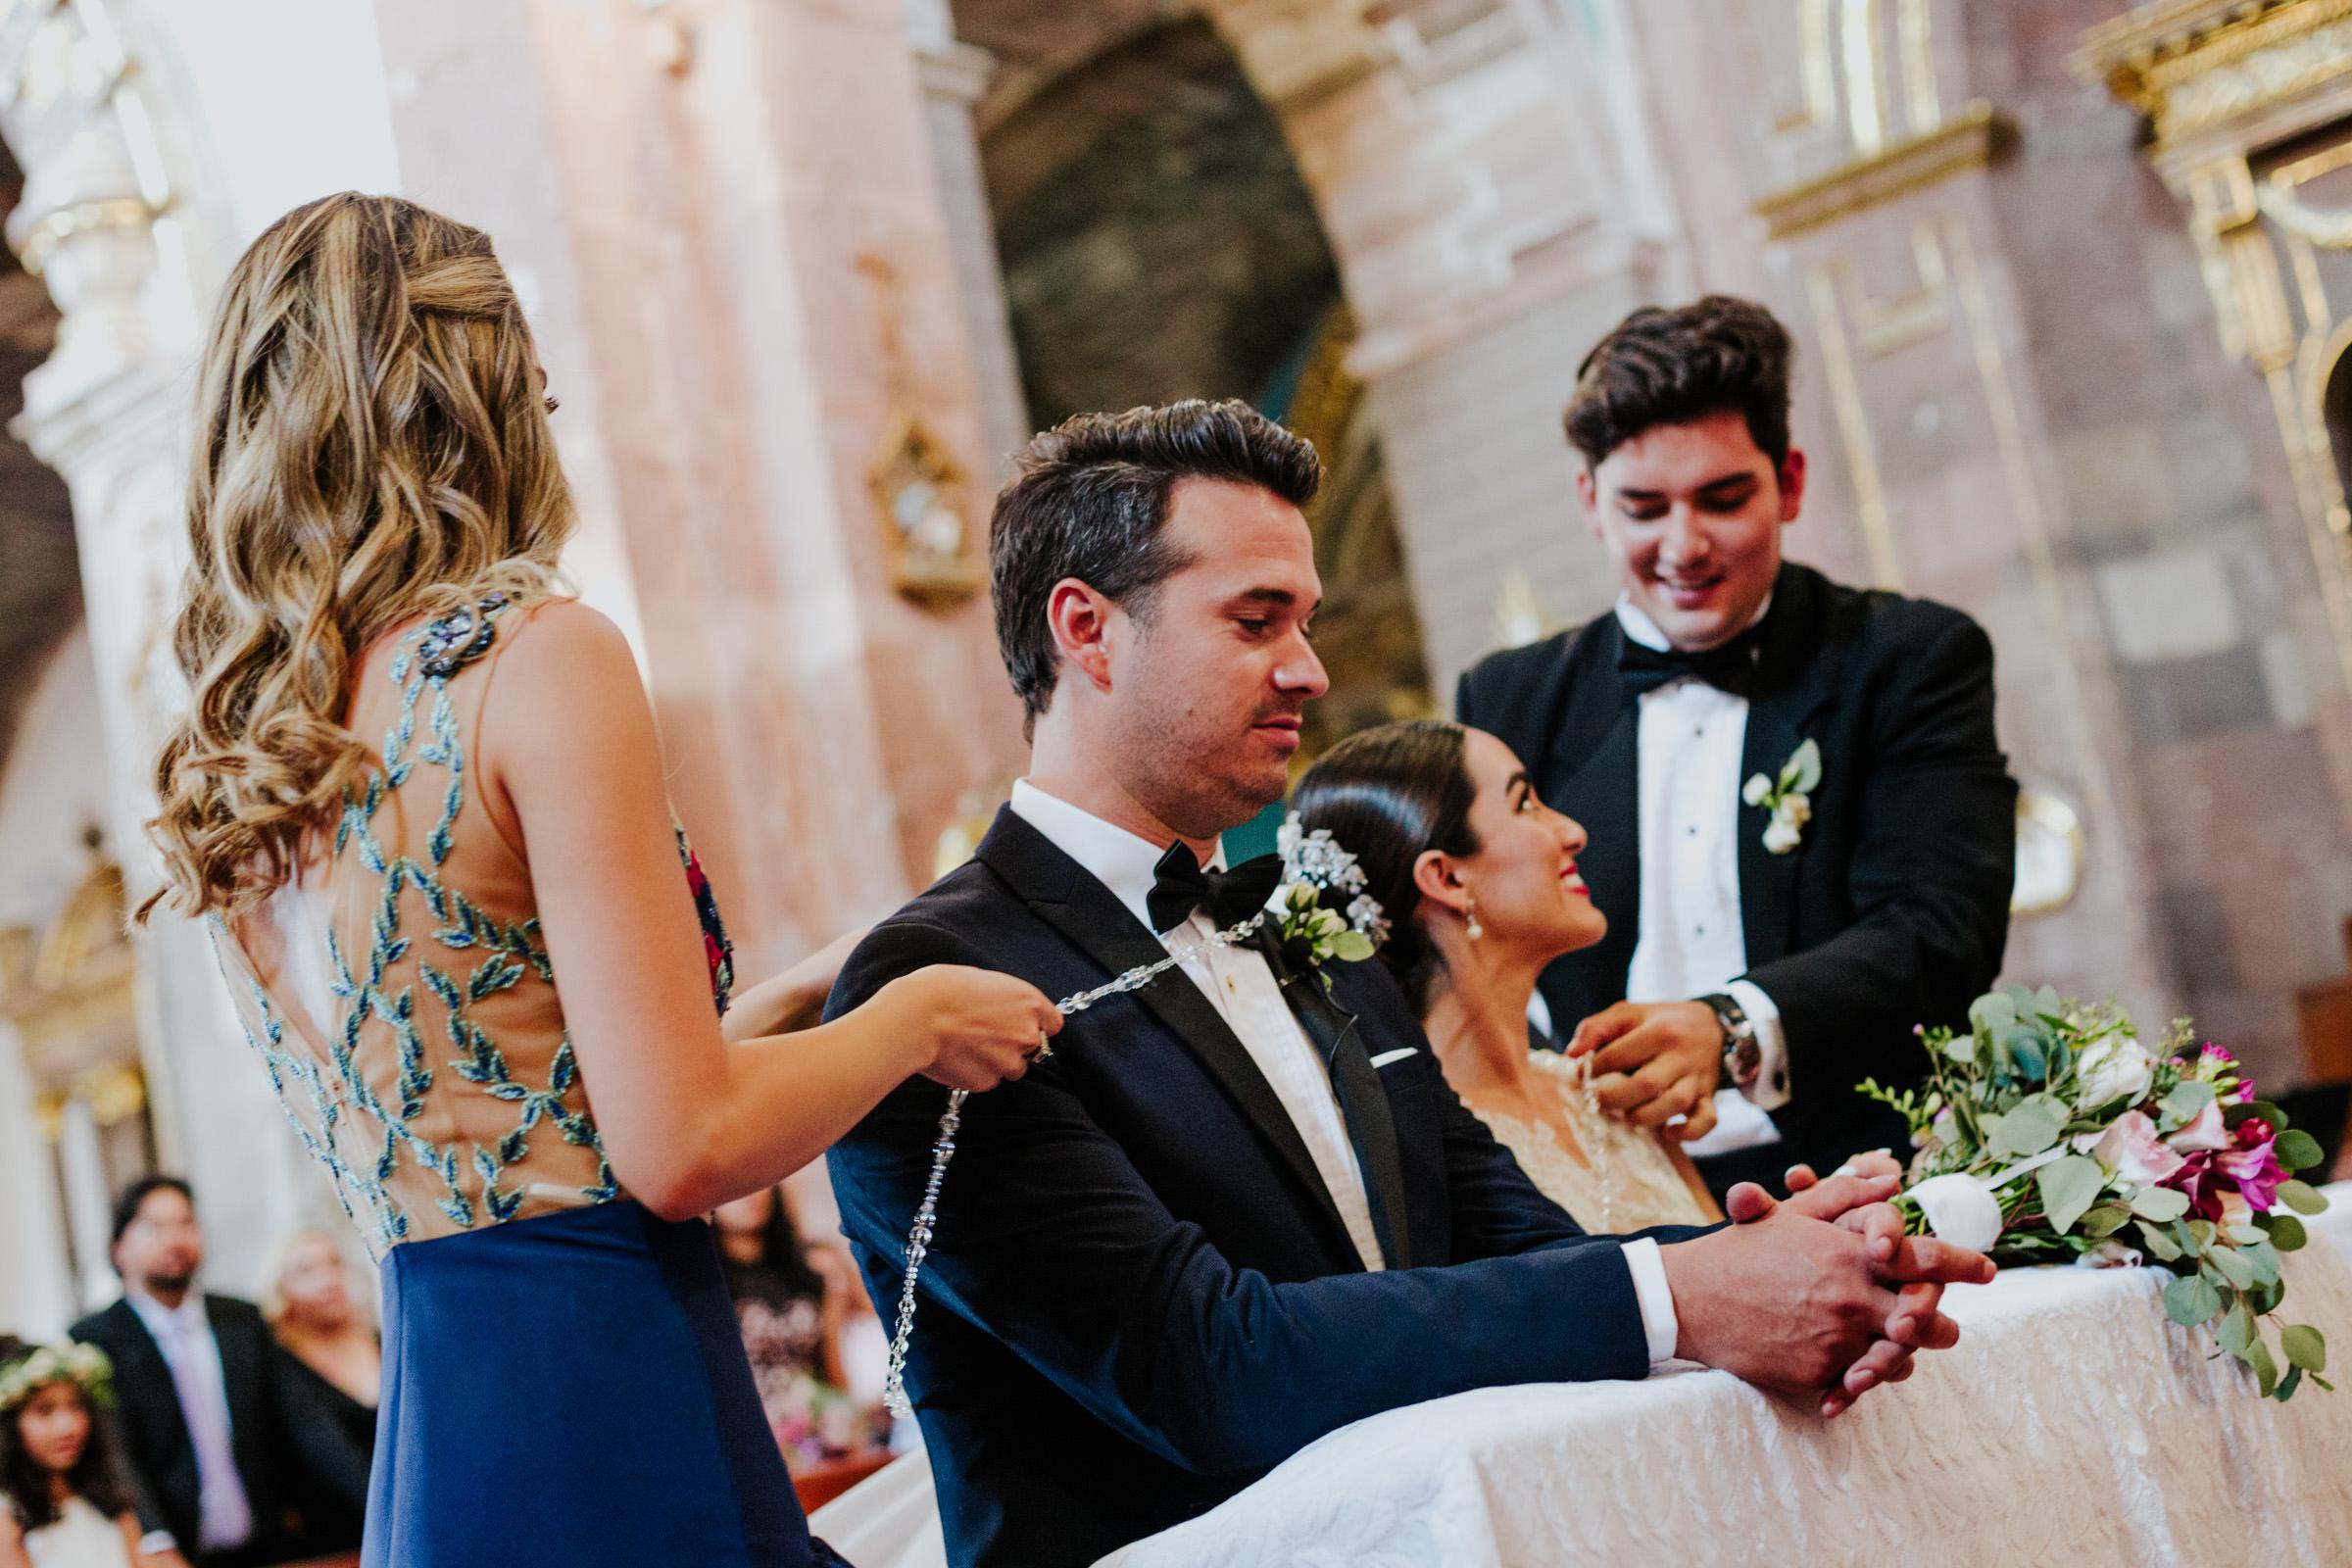 San-Miguel-de-Allende-Wedding-Photography-Parroquia-Instituto-Boda-Fotografia-Fer-Sergio-Pierce-Lifestyle-Photography0278.JPG